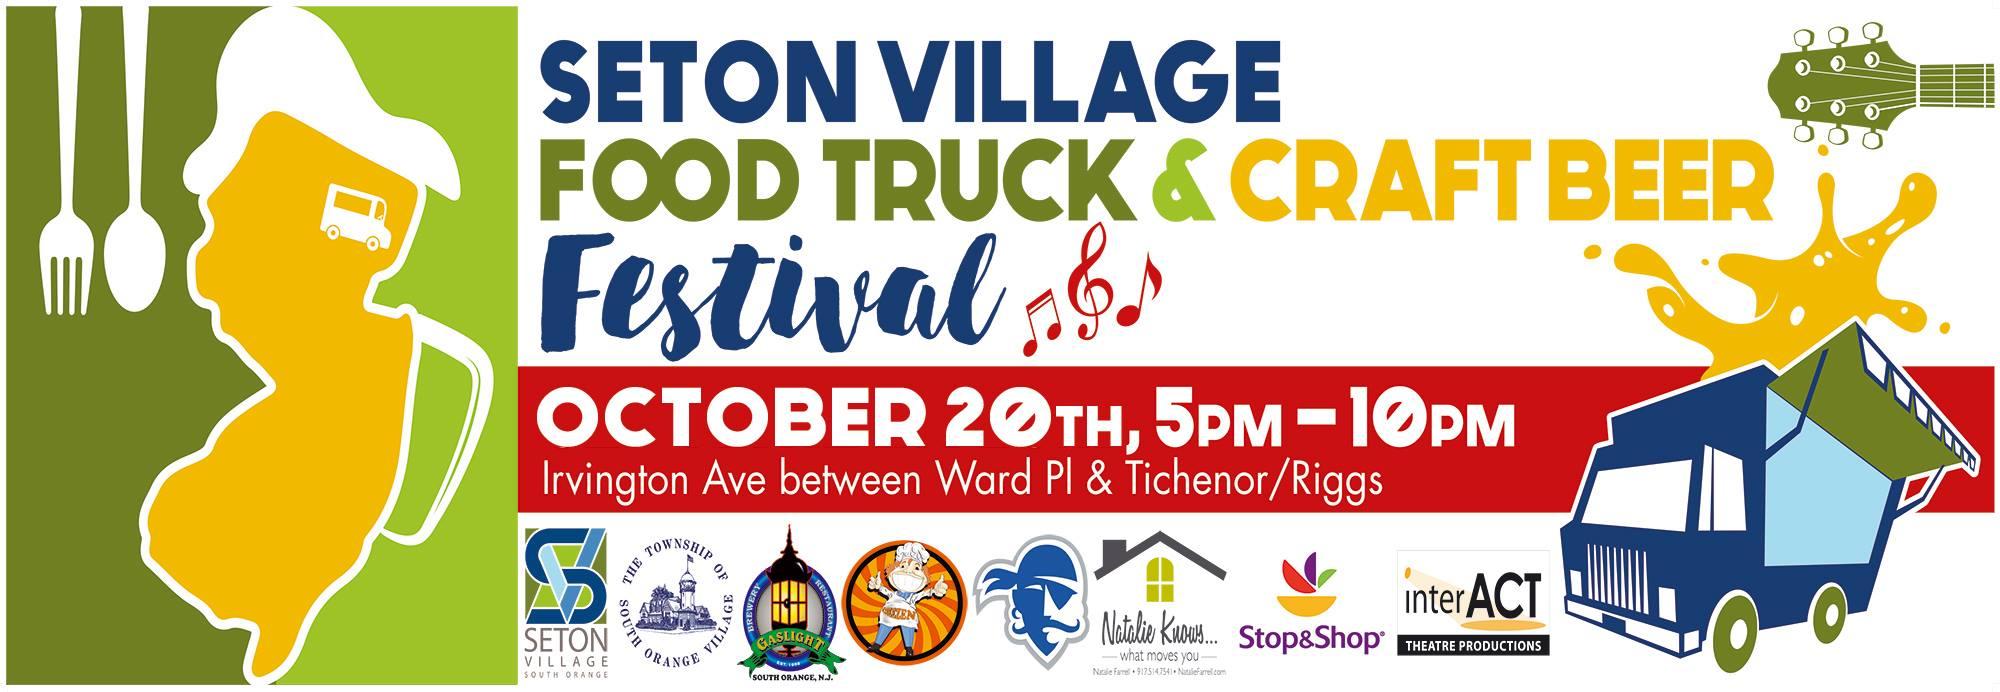 South Orange Food Truck Festival